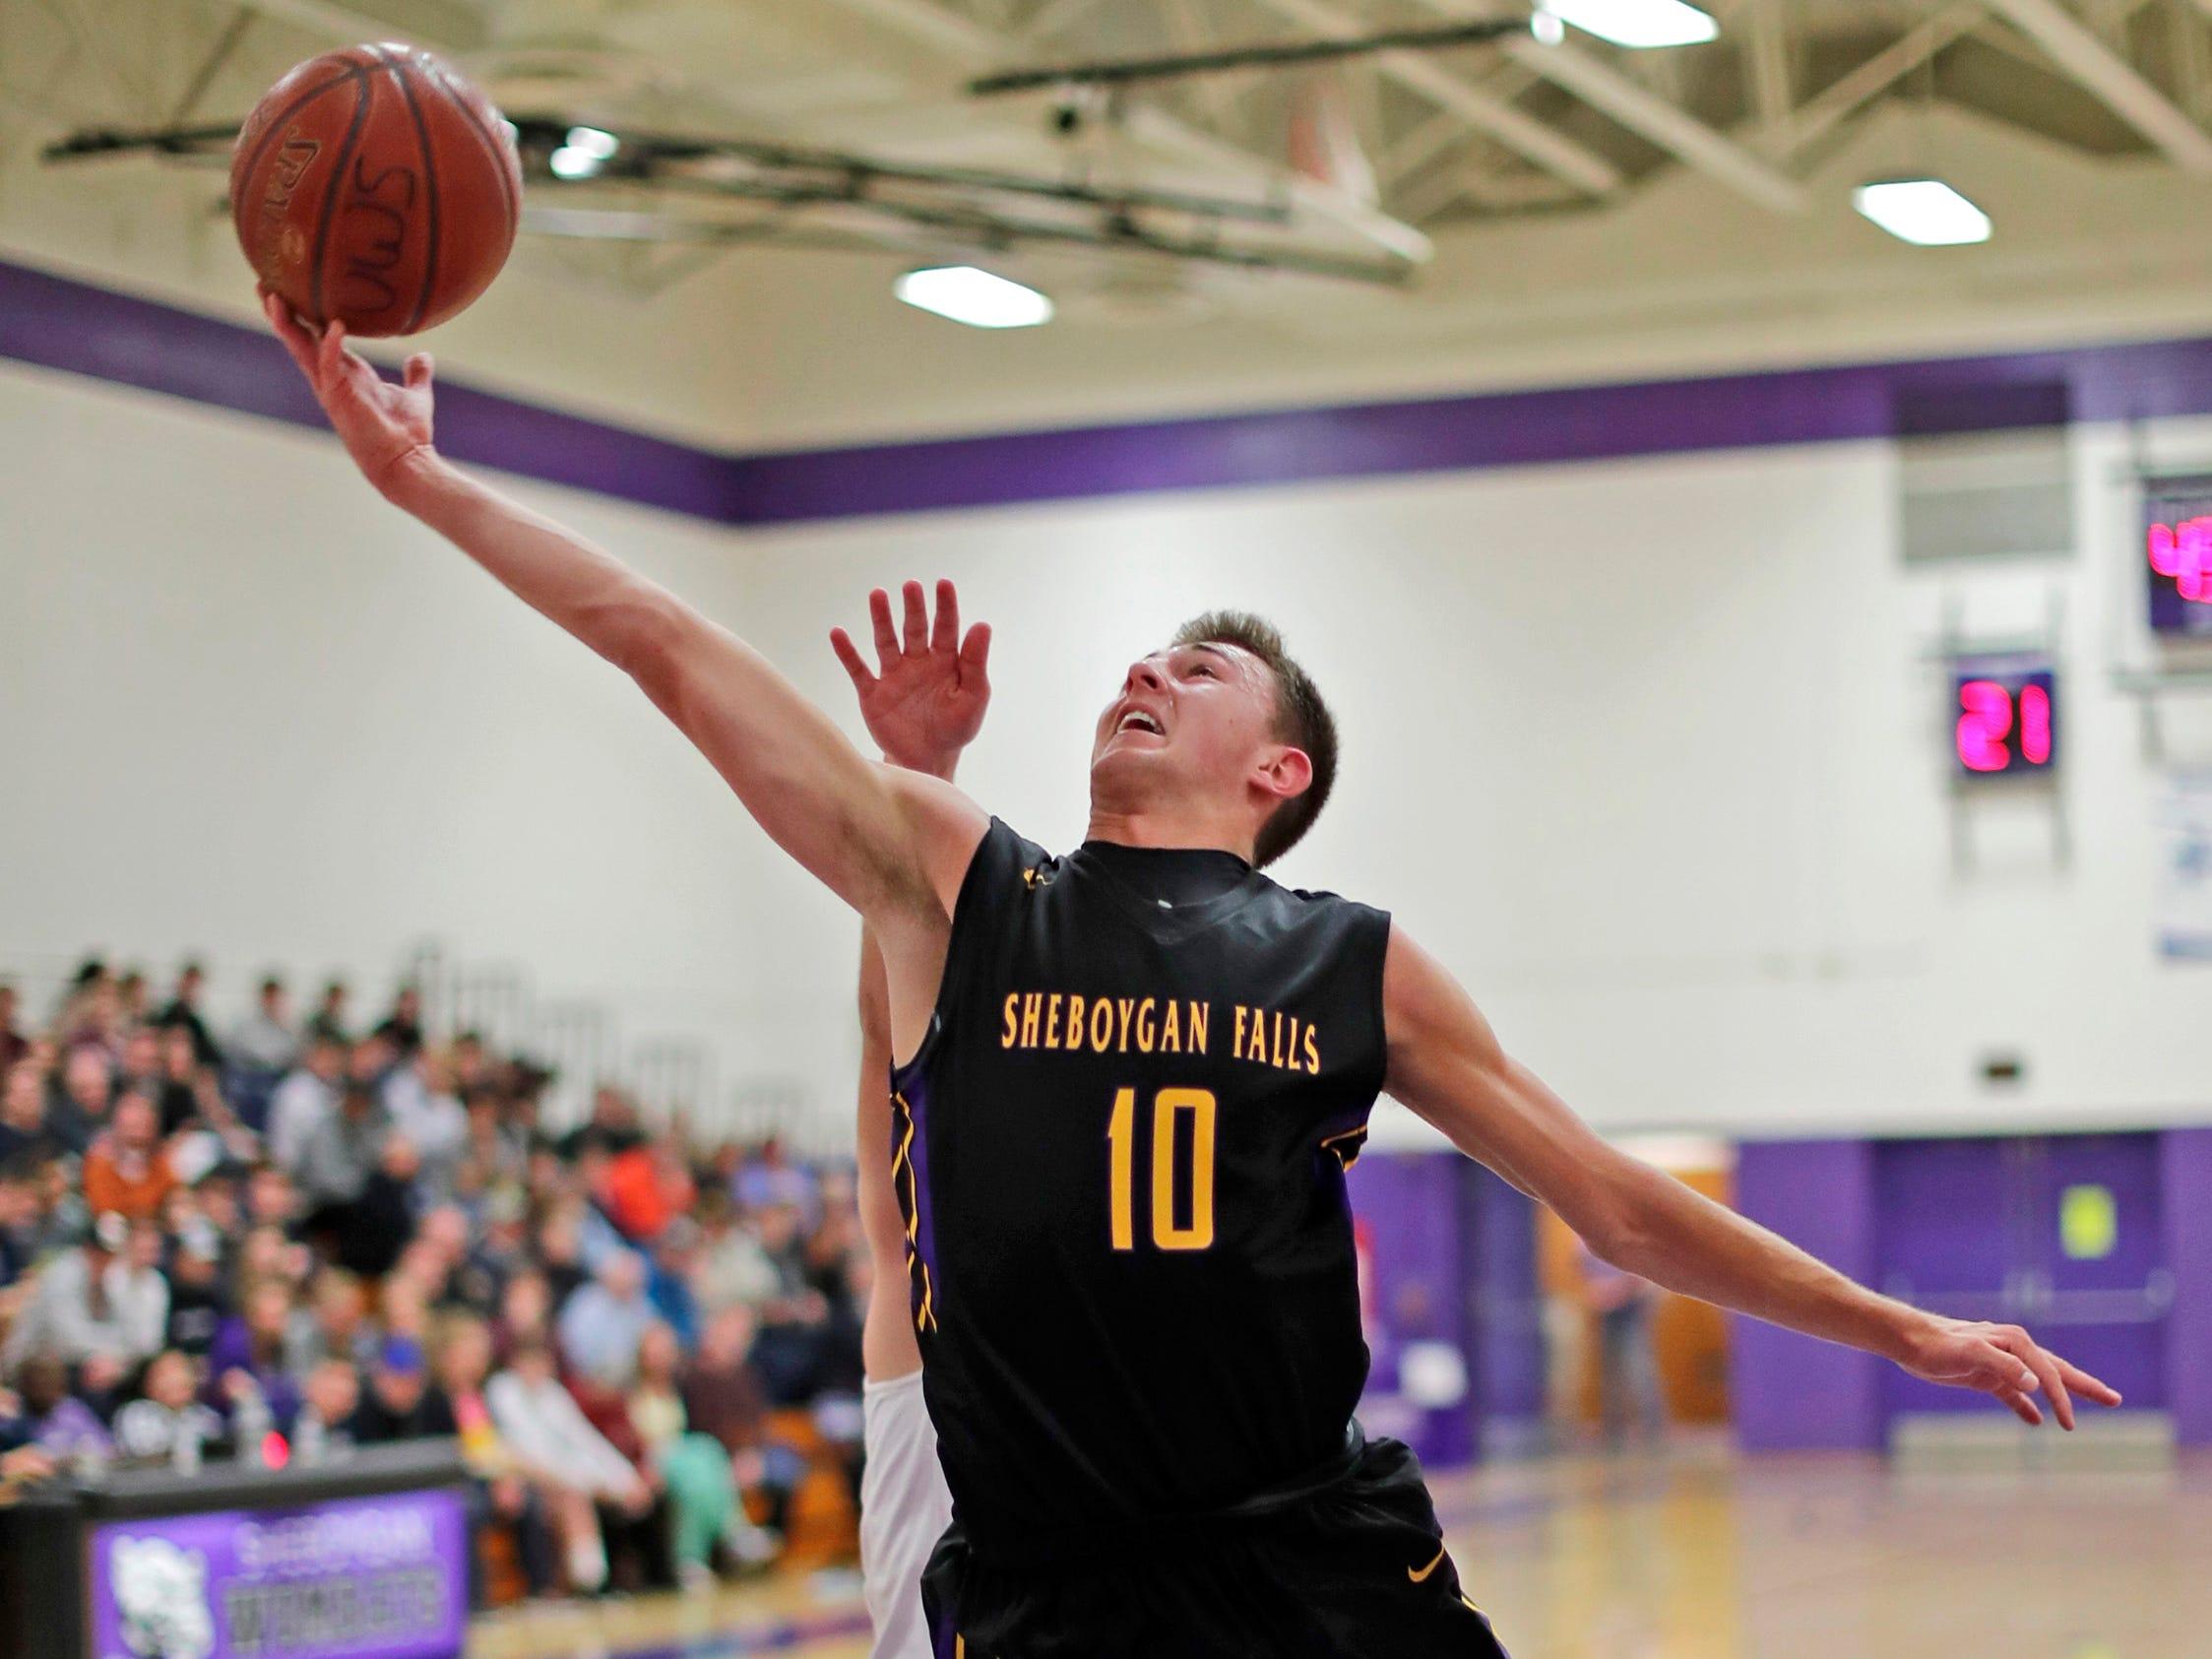 Sheboygan Falls' Justin Tenpas (10) drives to the basket, during the Sheboygan Area Senior All-Stars game, at UW-Sheboygan, Sunday, April 7, 2019, in Sheboygan, Wis.